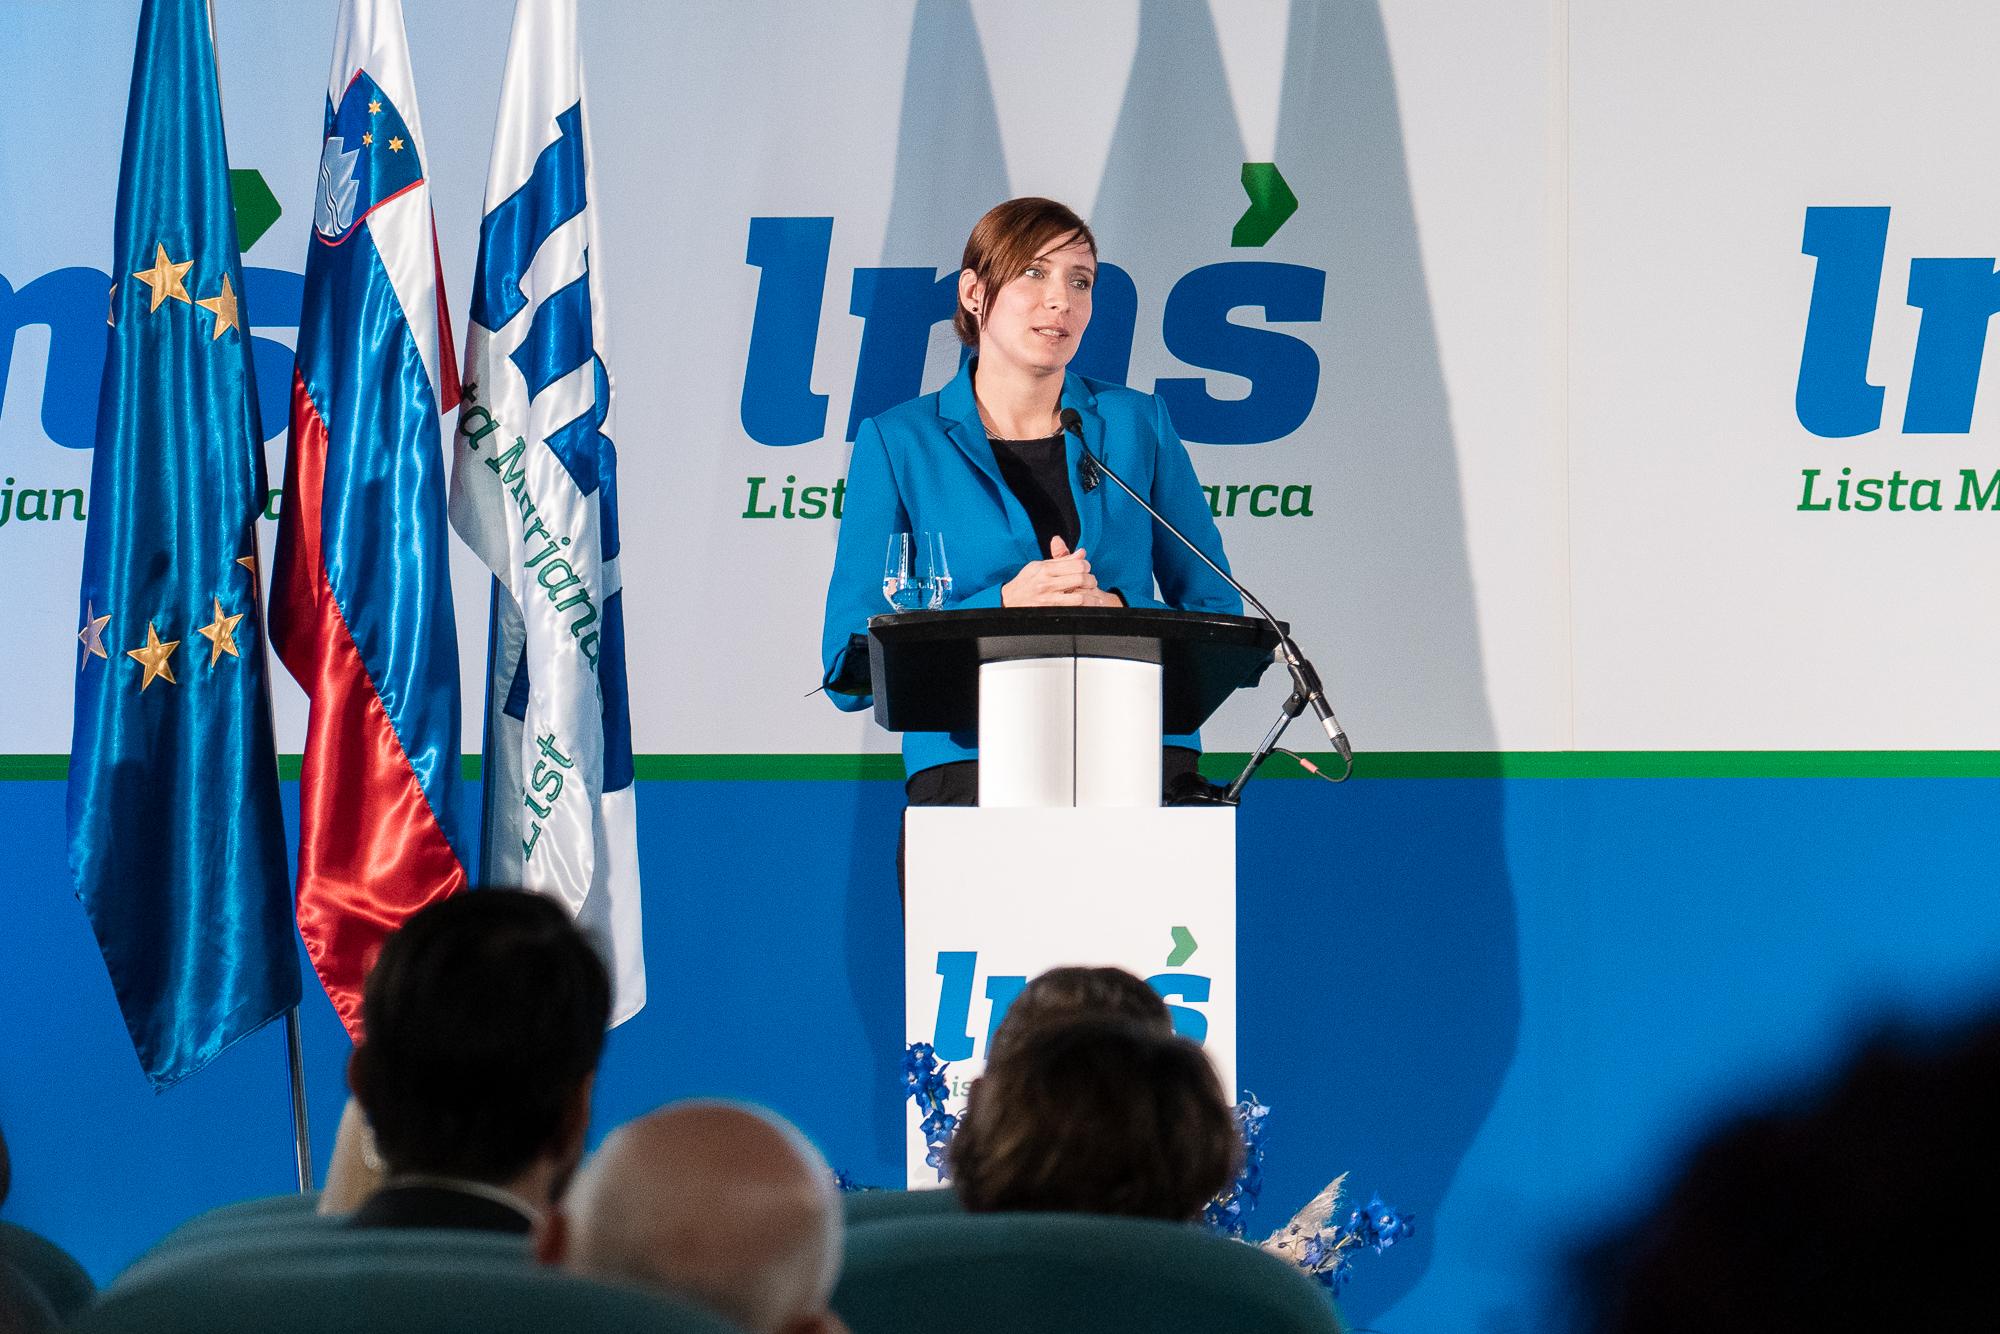 Jasna Gabrič, Mayor of Municipality of Trbovlje, on the stage at the Fifth Congress of Lista Marjana Šarca in Trbovlje